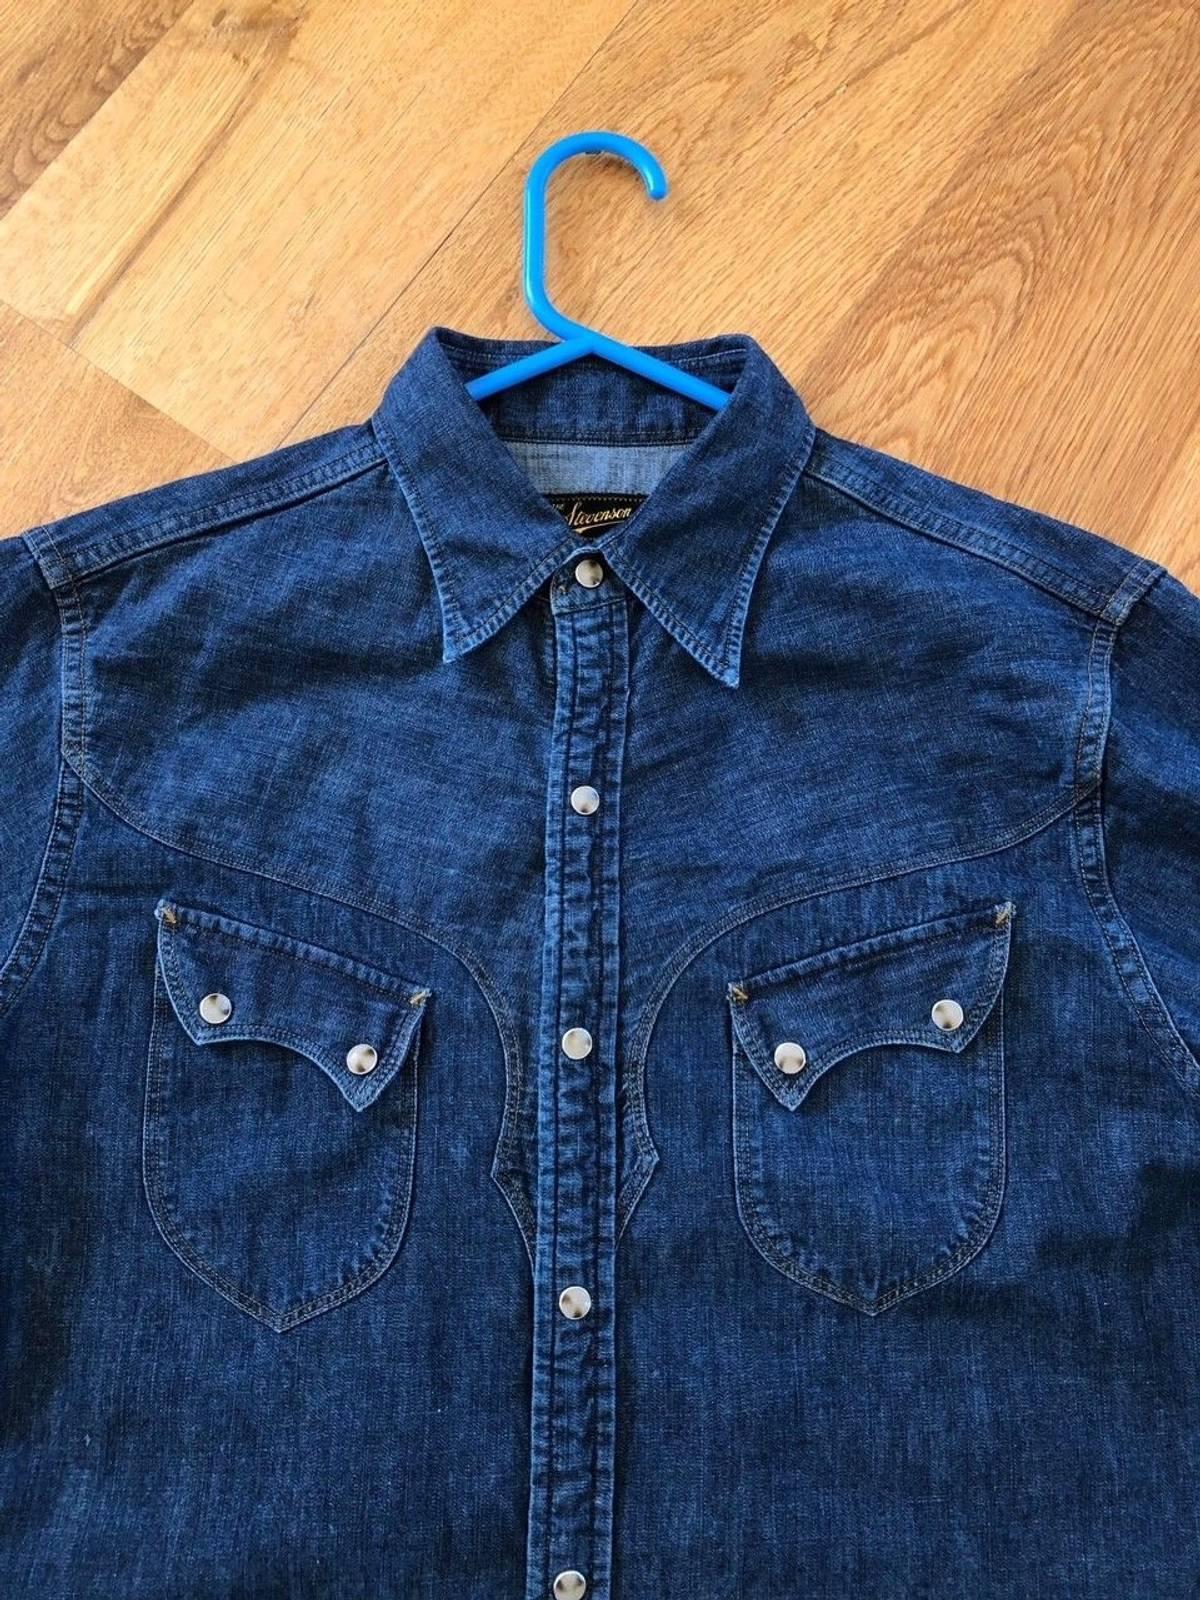 da26f4fcf3 Stevenson Overall Co. CODY WESTERN SNAP SHIRT - WASHED DOWN INDIGO DENIM  Size m - Shirts (Button Ups) for Sale - Grailed